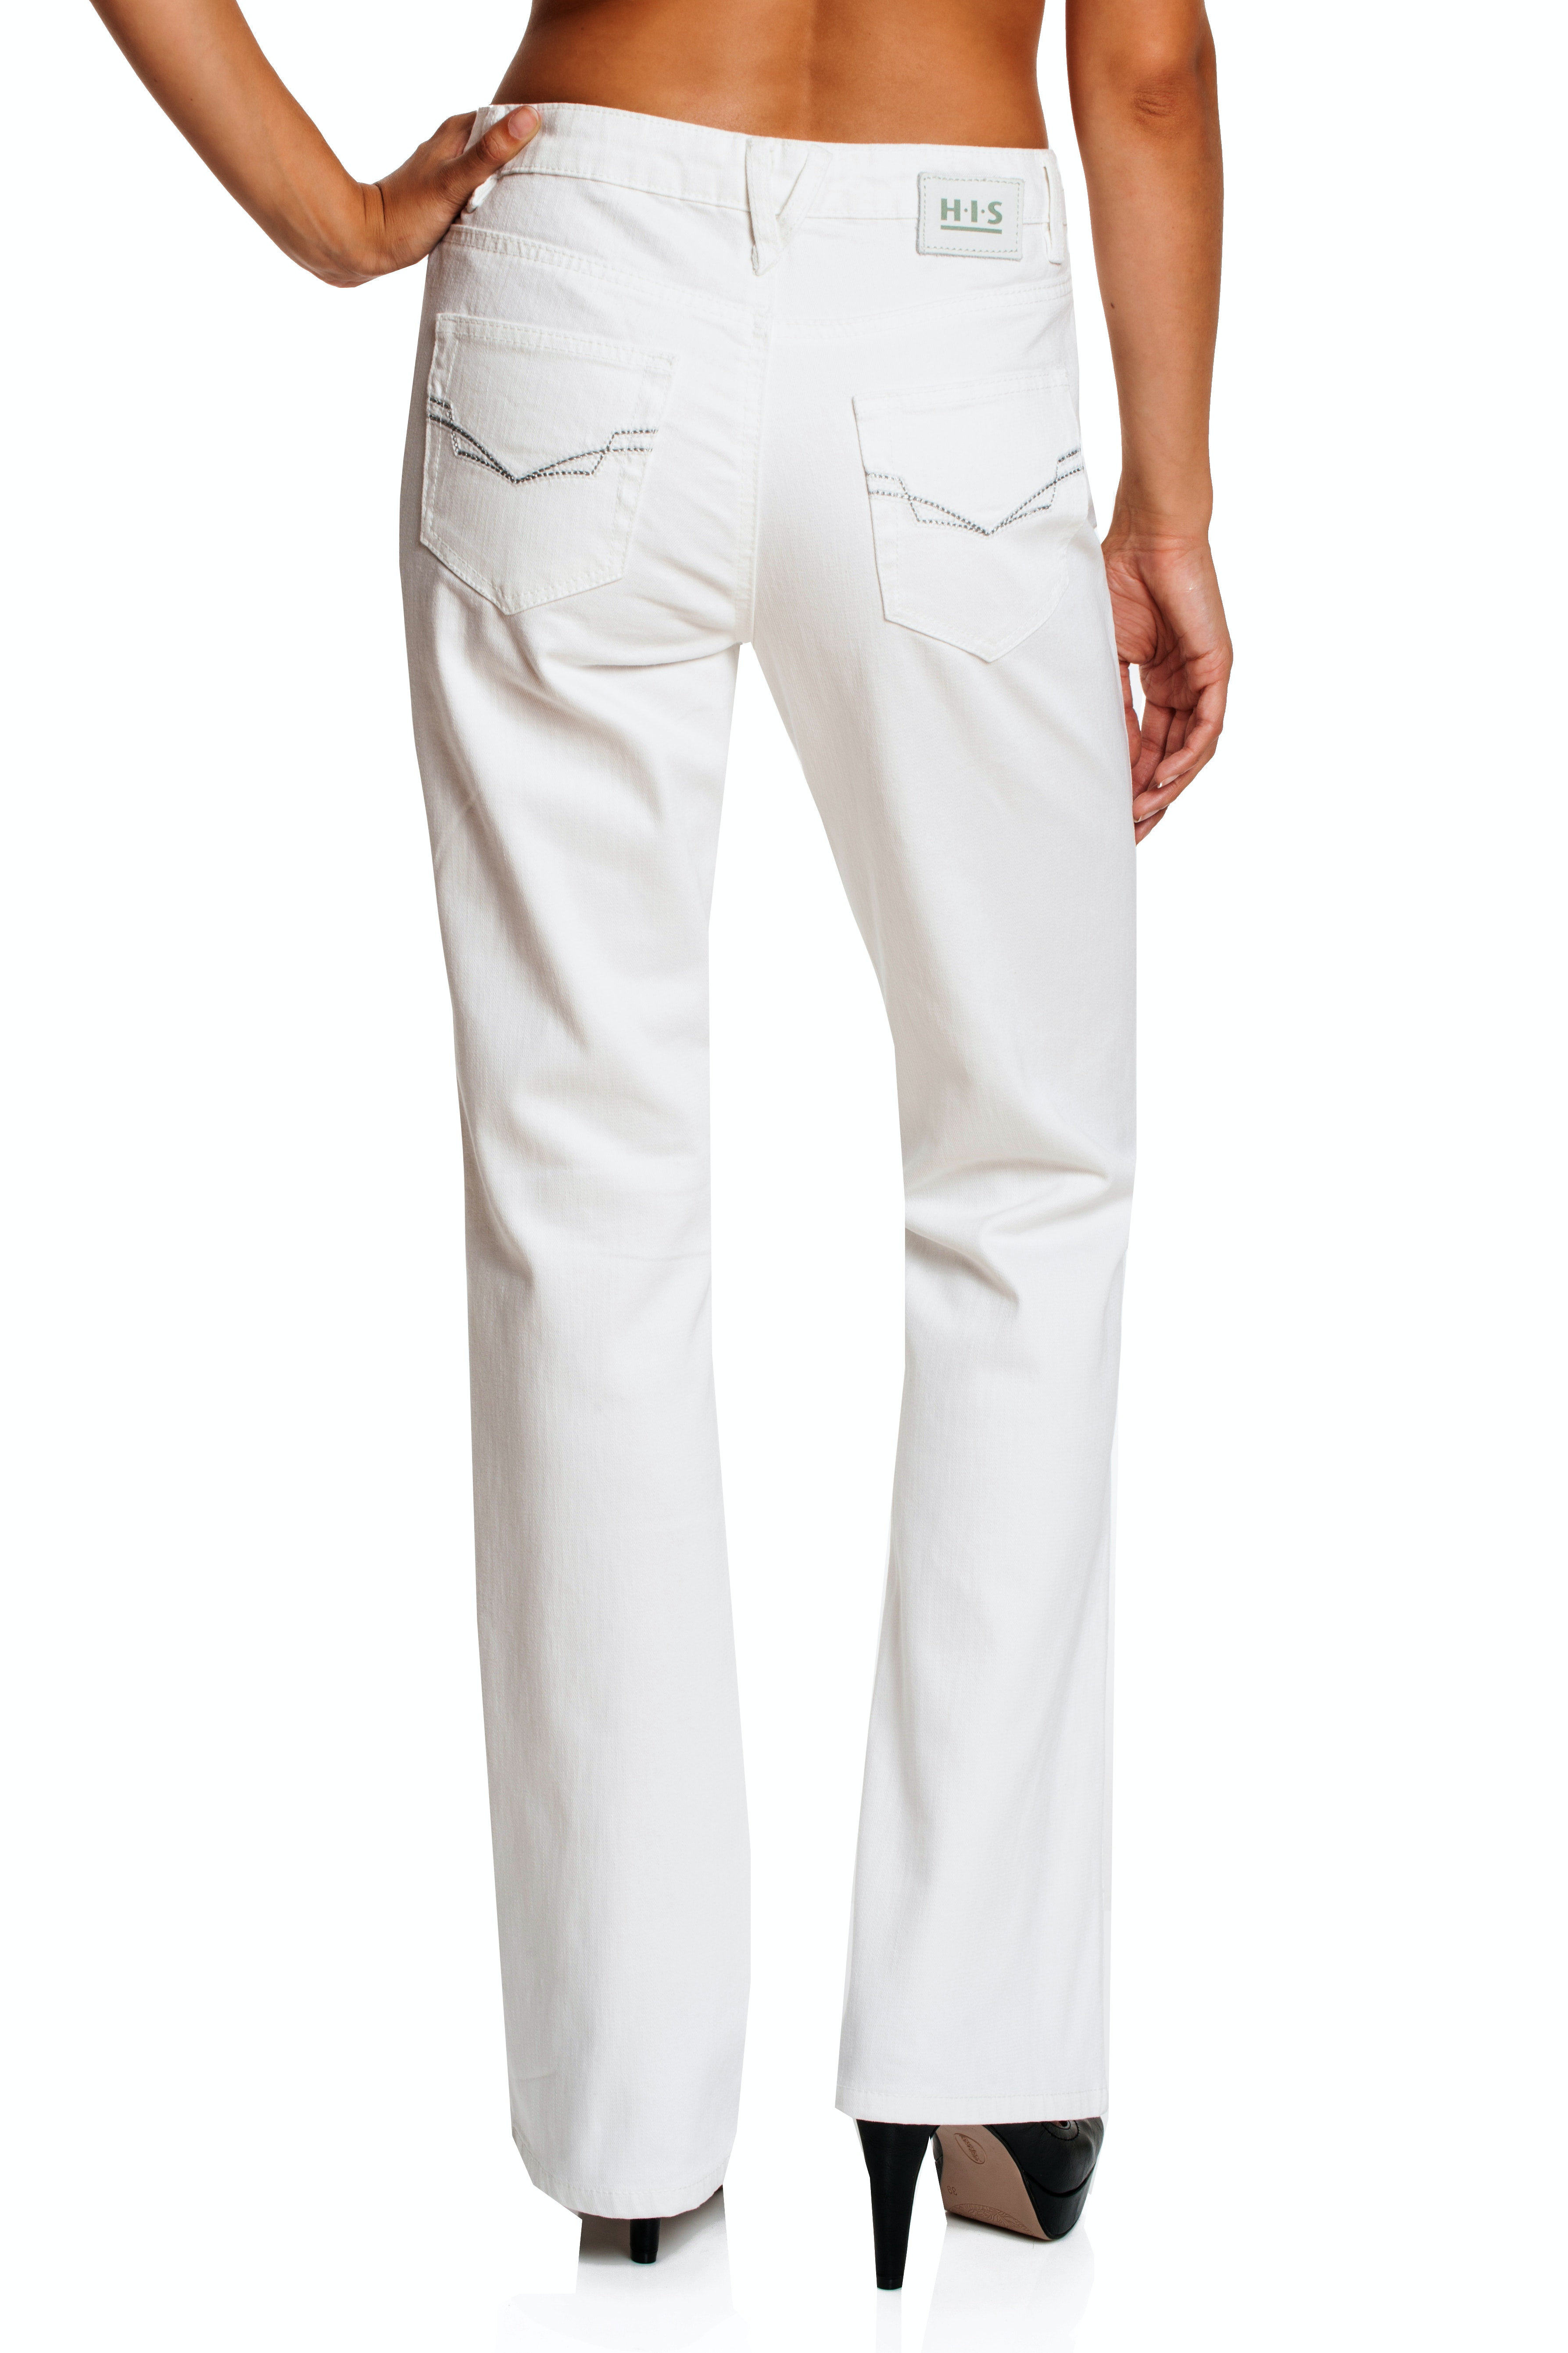 H.I.S. Jeans Sunny